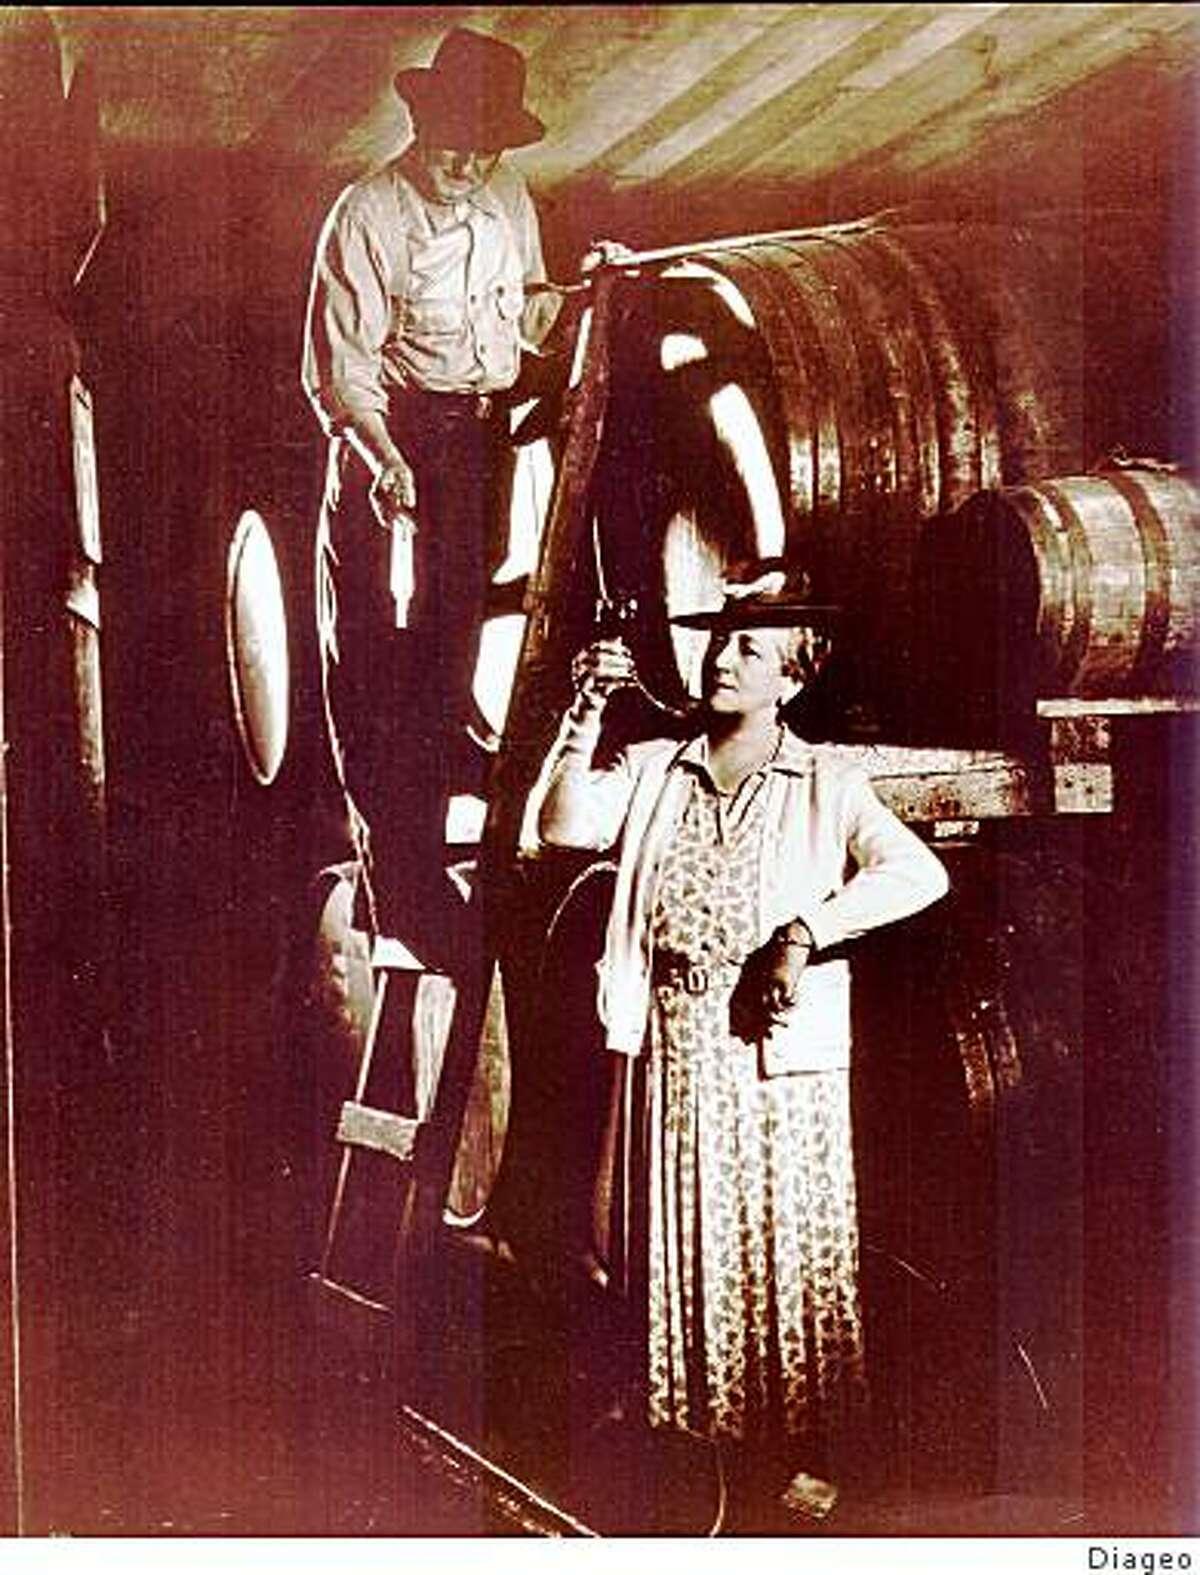 Fernande de Latour (bottom) and Joseph Ponti, Beaulieu Vineyard's first vineyard manager, in the early 1940s.